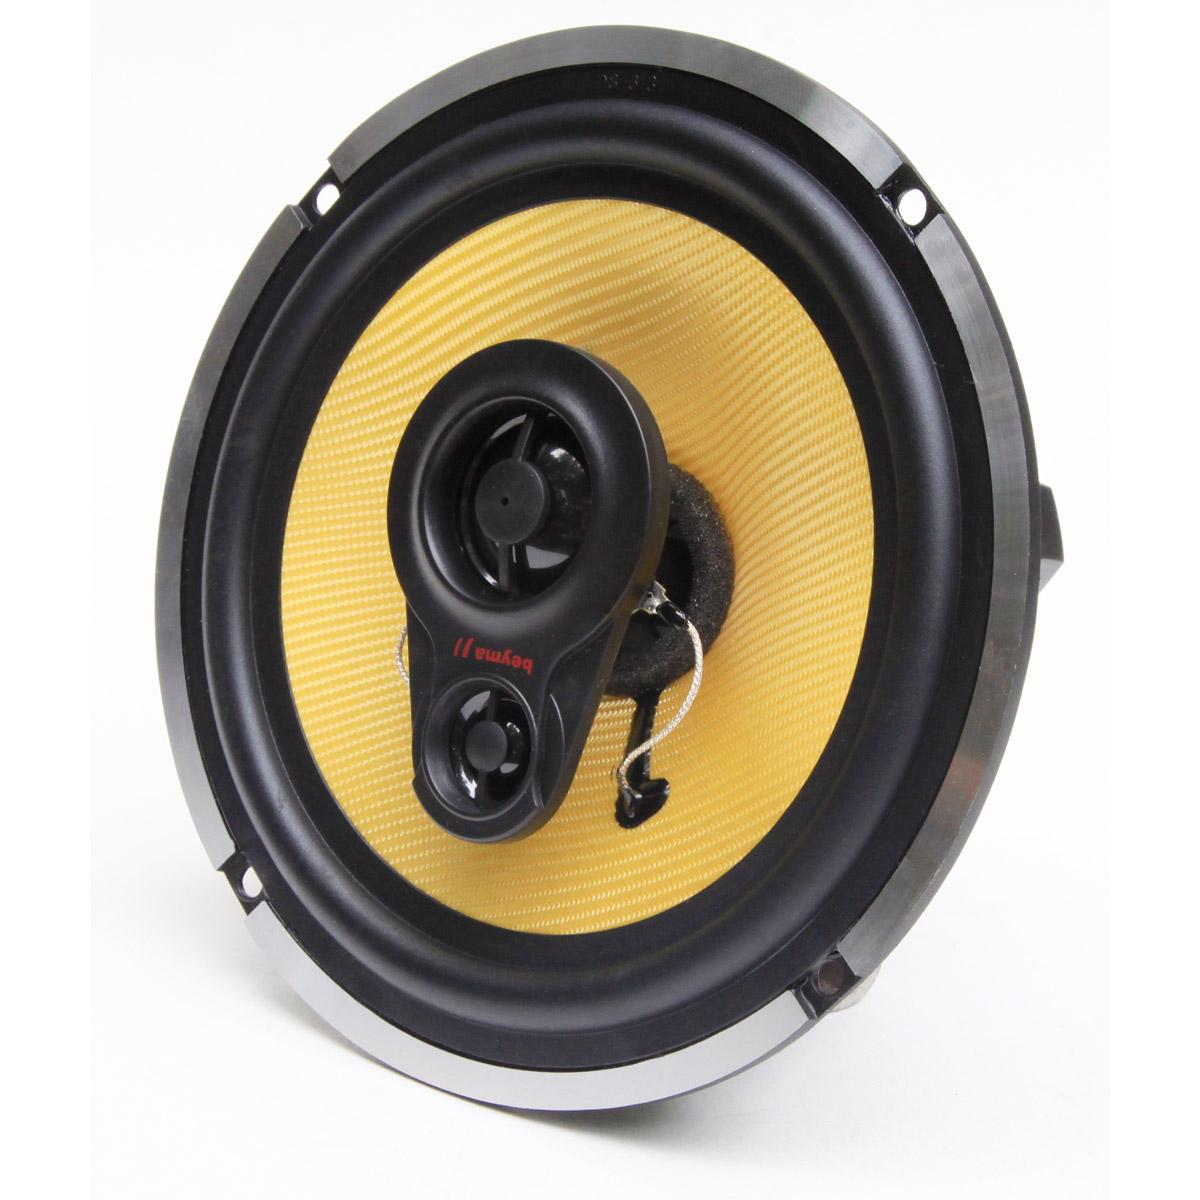 Beyma Sc-603 6.5-Inch 4 Ohm 300 Watt 3 Way Sound Concept Series Car Speakers